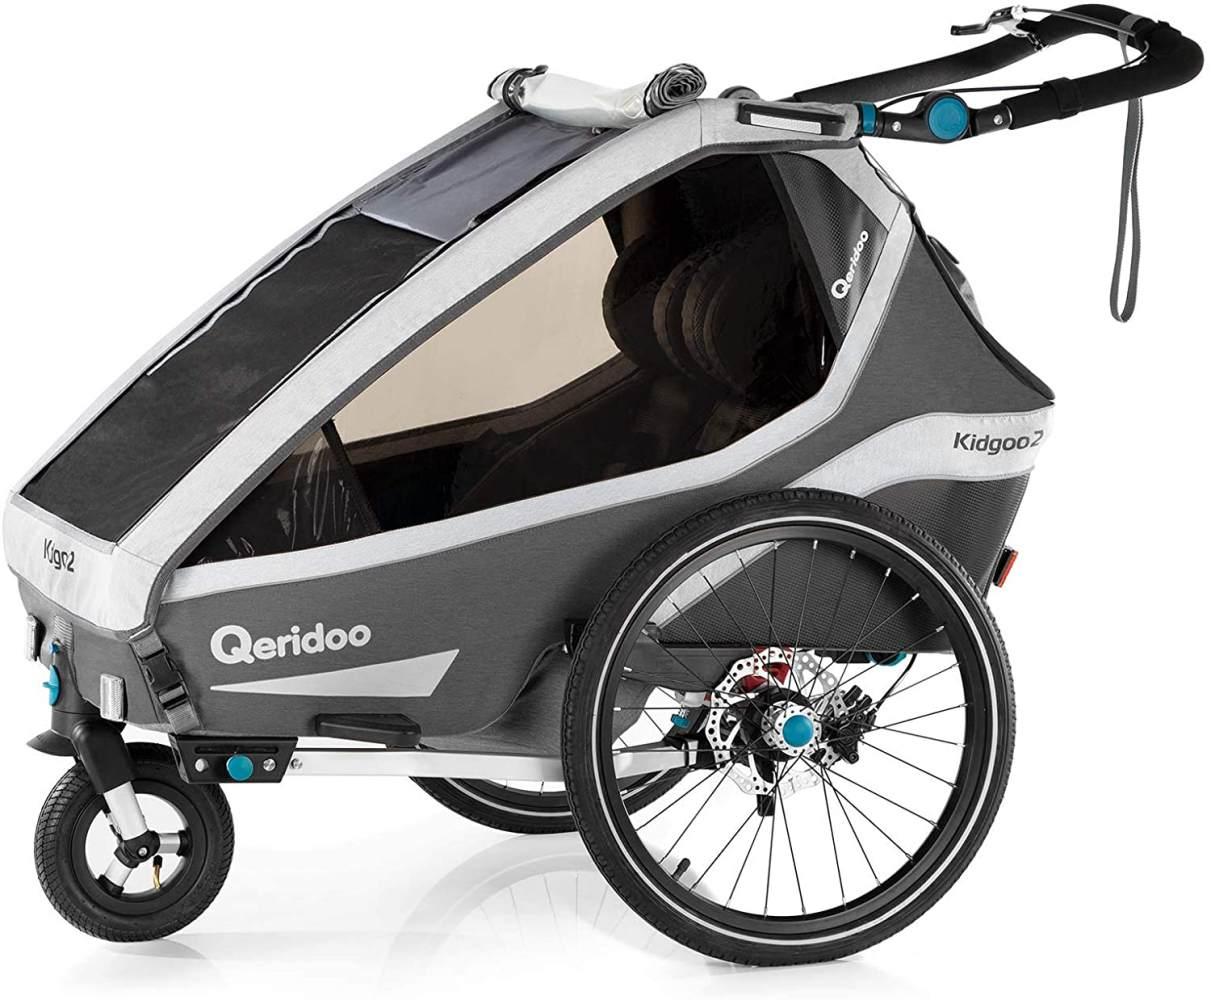 Qeridoo 'Kidgoo2 Sport' Fahrradanhänger 2020 Grau, 2-Sitzer, inkl. luftbereiftes Buggyrad Bild 1